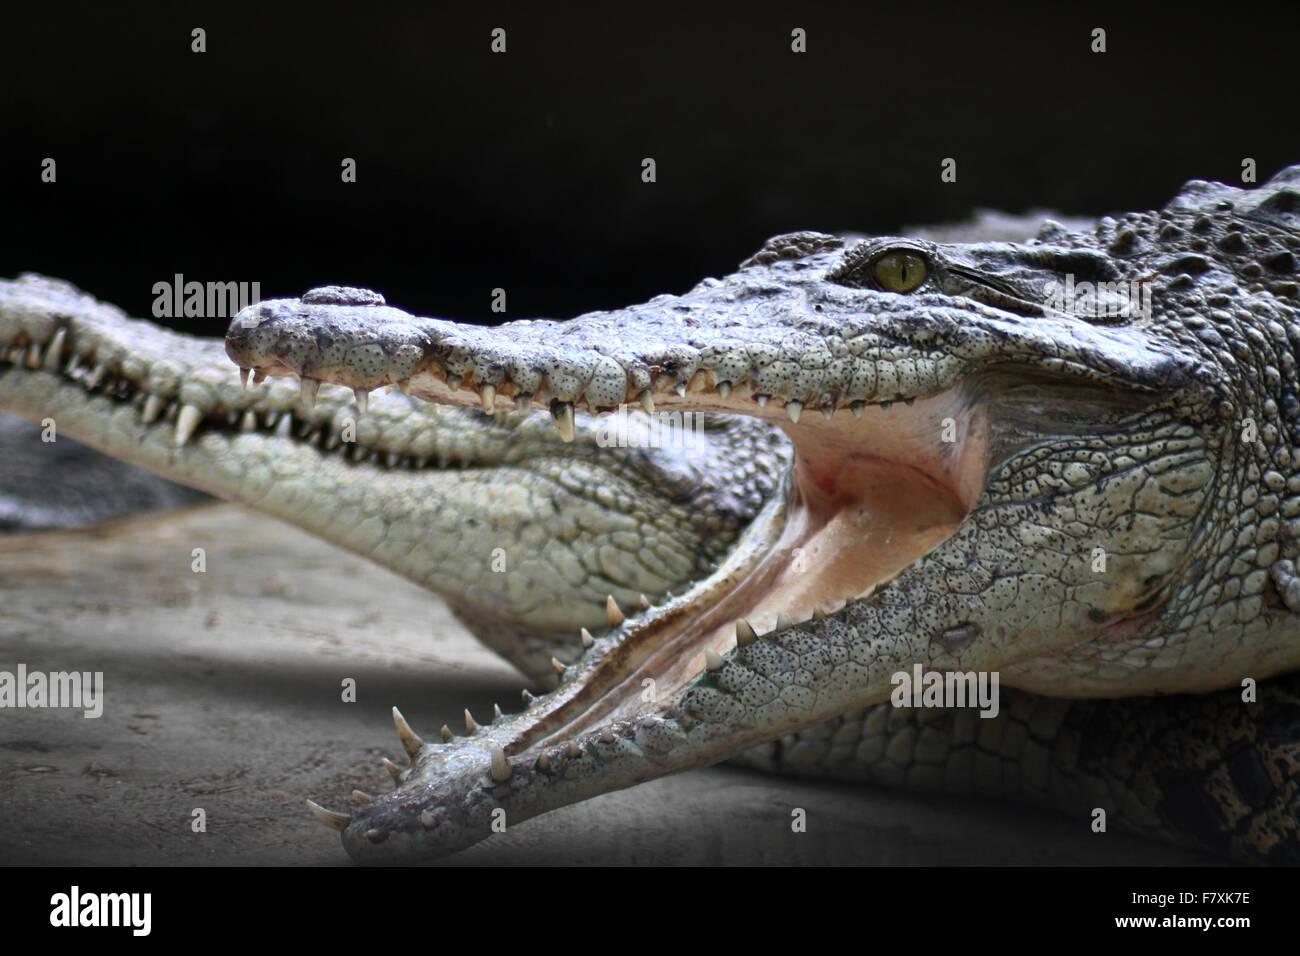 Medan, North Sumatra, Indonesia. 3rd Dec, 2015. Crocodiles congregate at feeding time at the crocodile farm. The - Stock Image